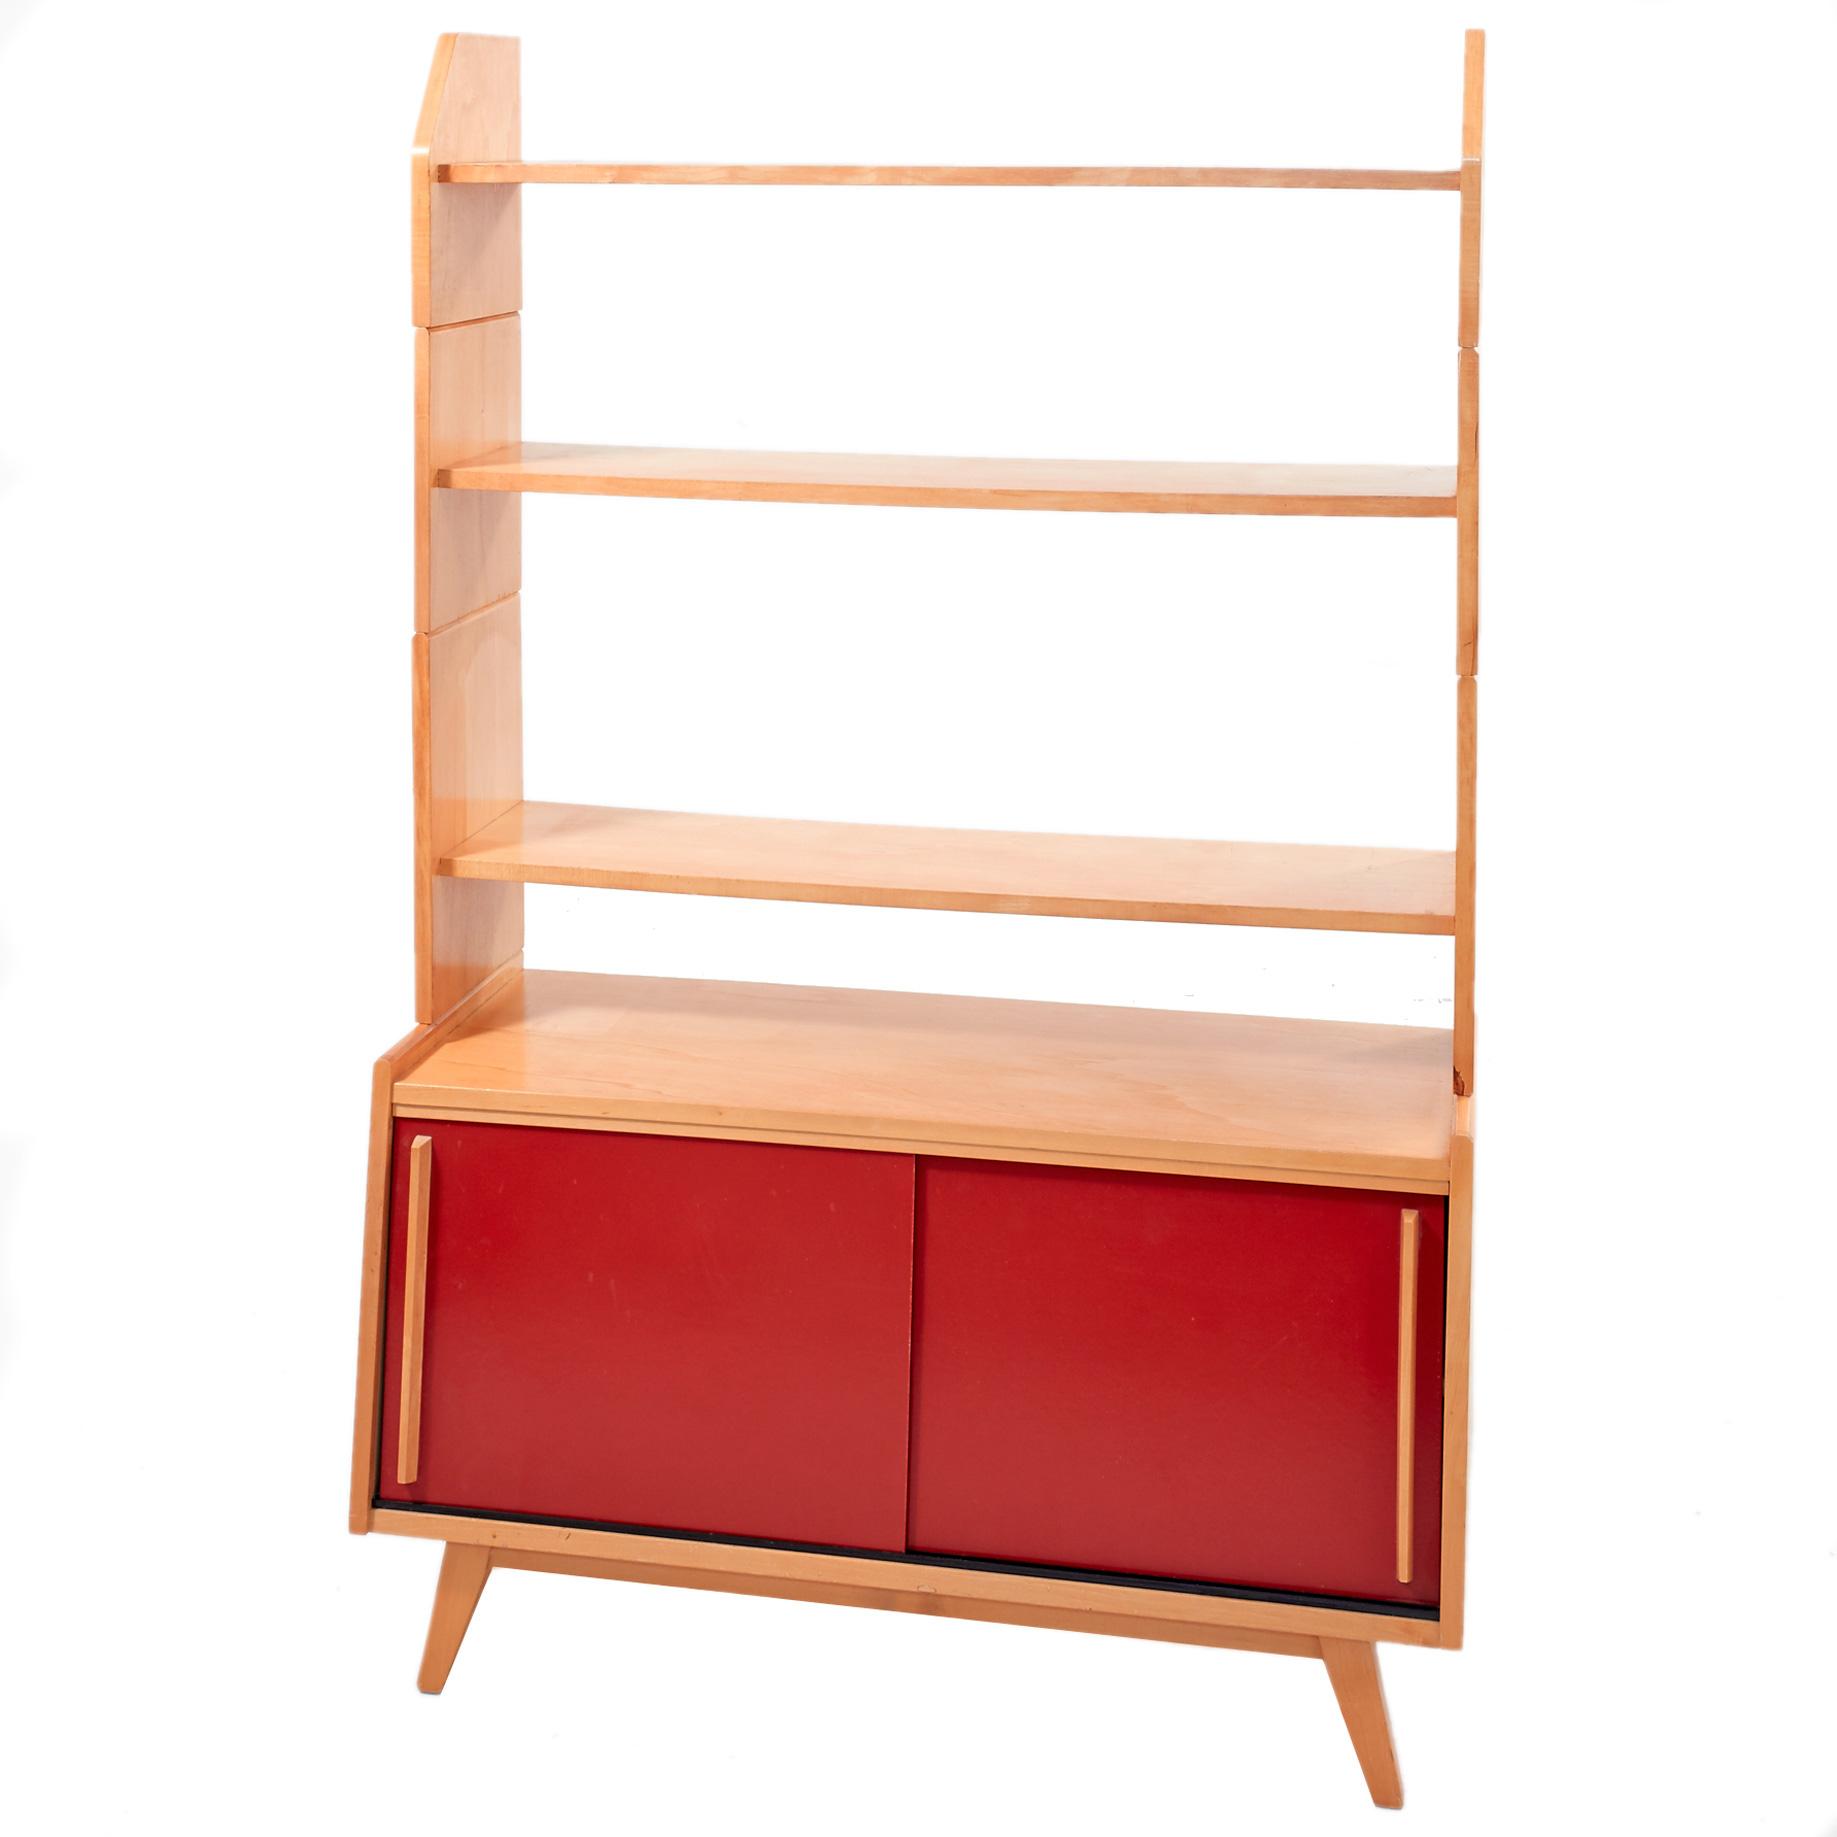 schiebeschrank mit aufsetzbarem regal m bel z rich vintagem bel. Black Bedroom Furniture Sets. Home Design Ideas